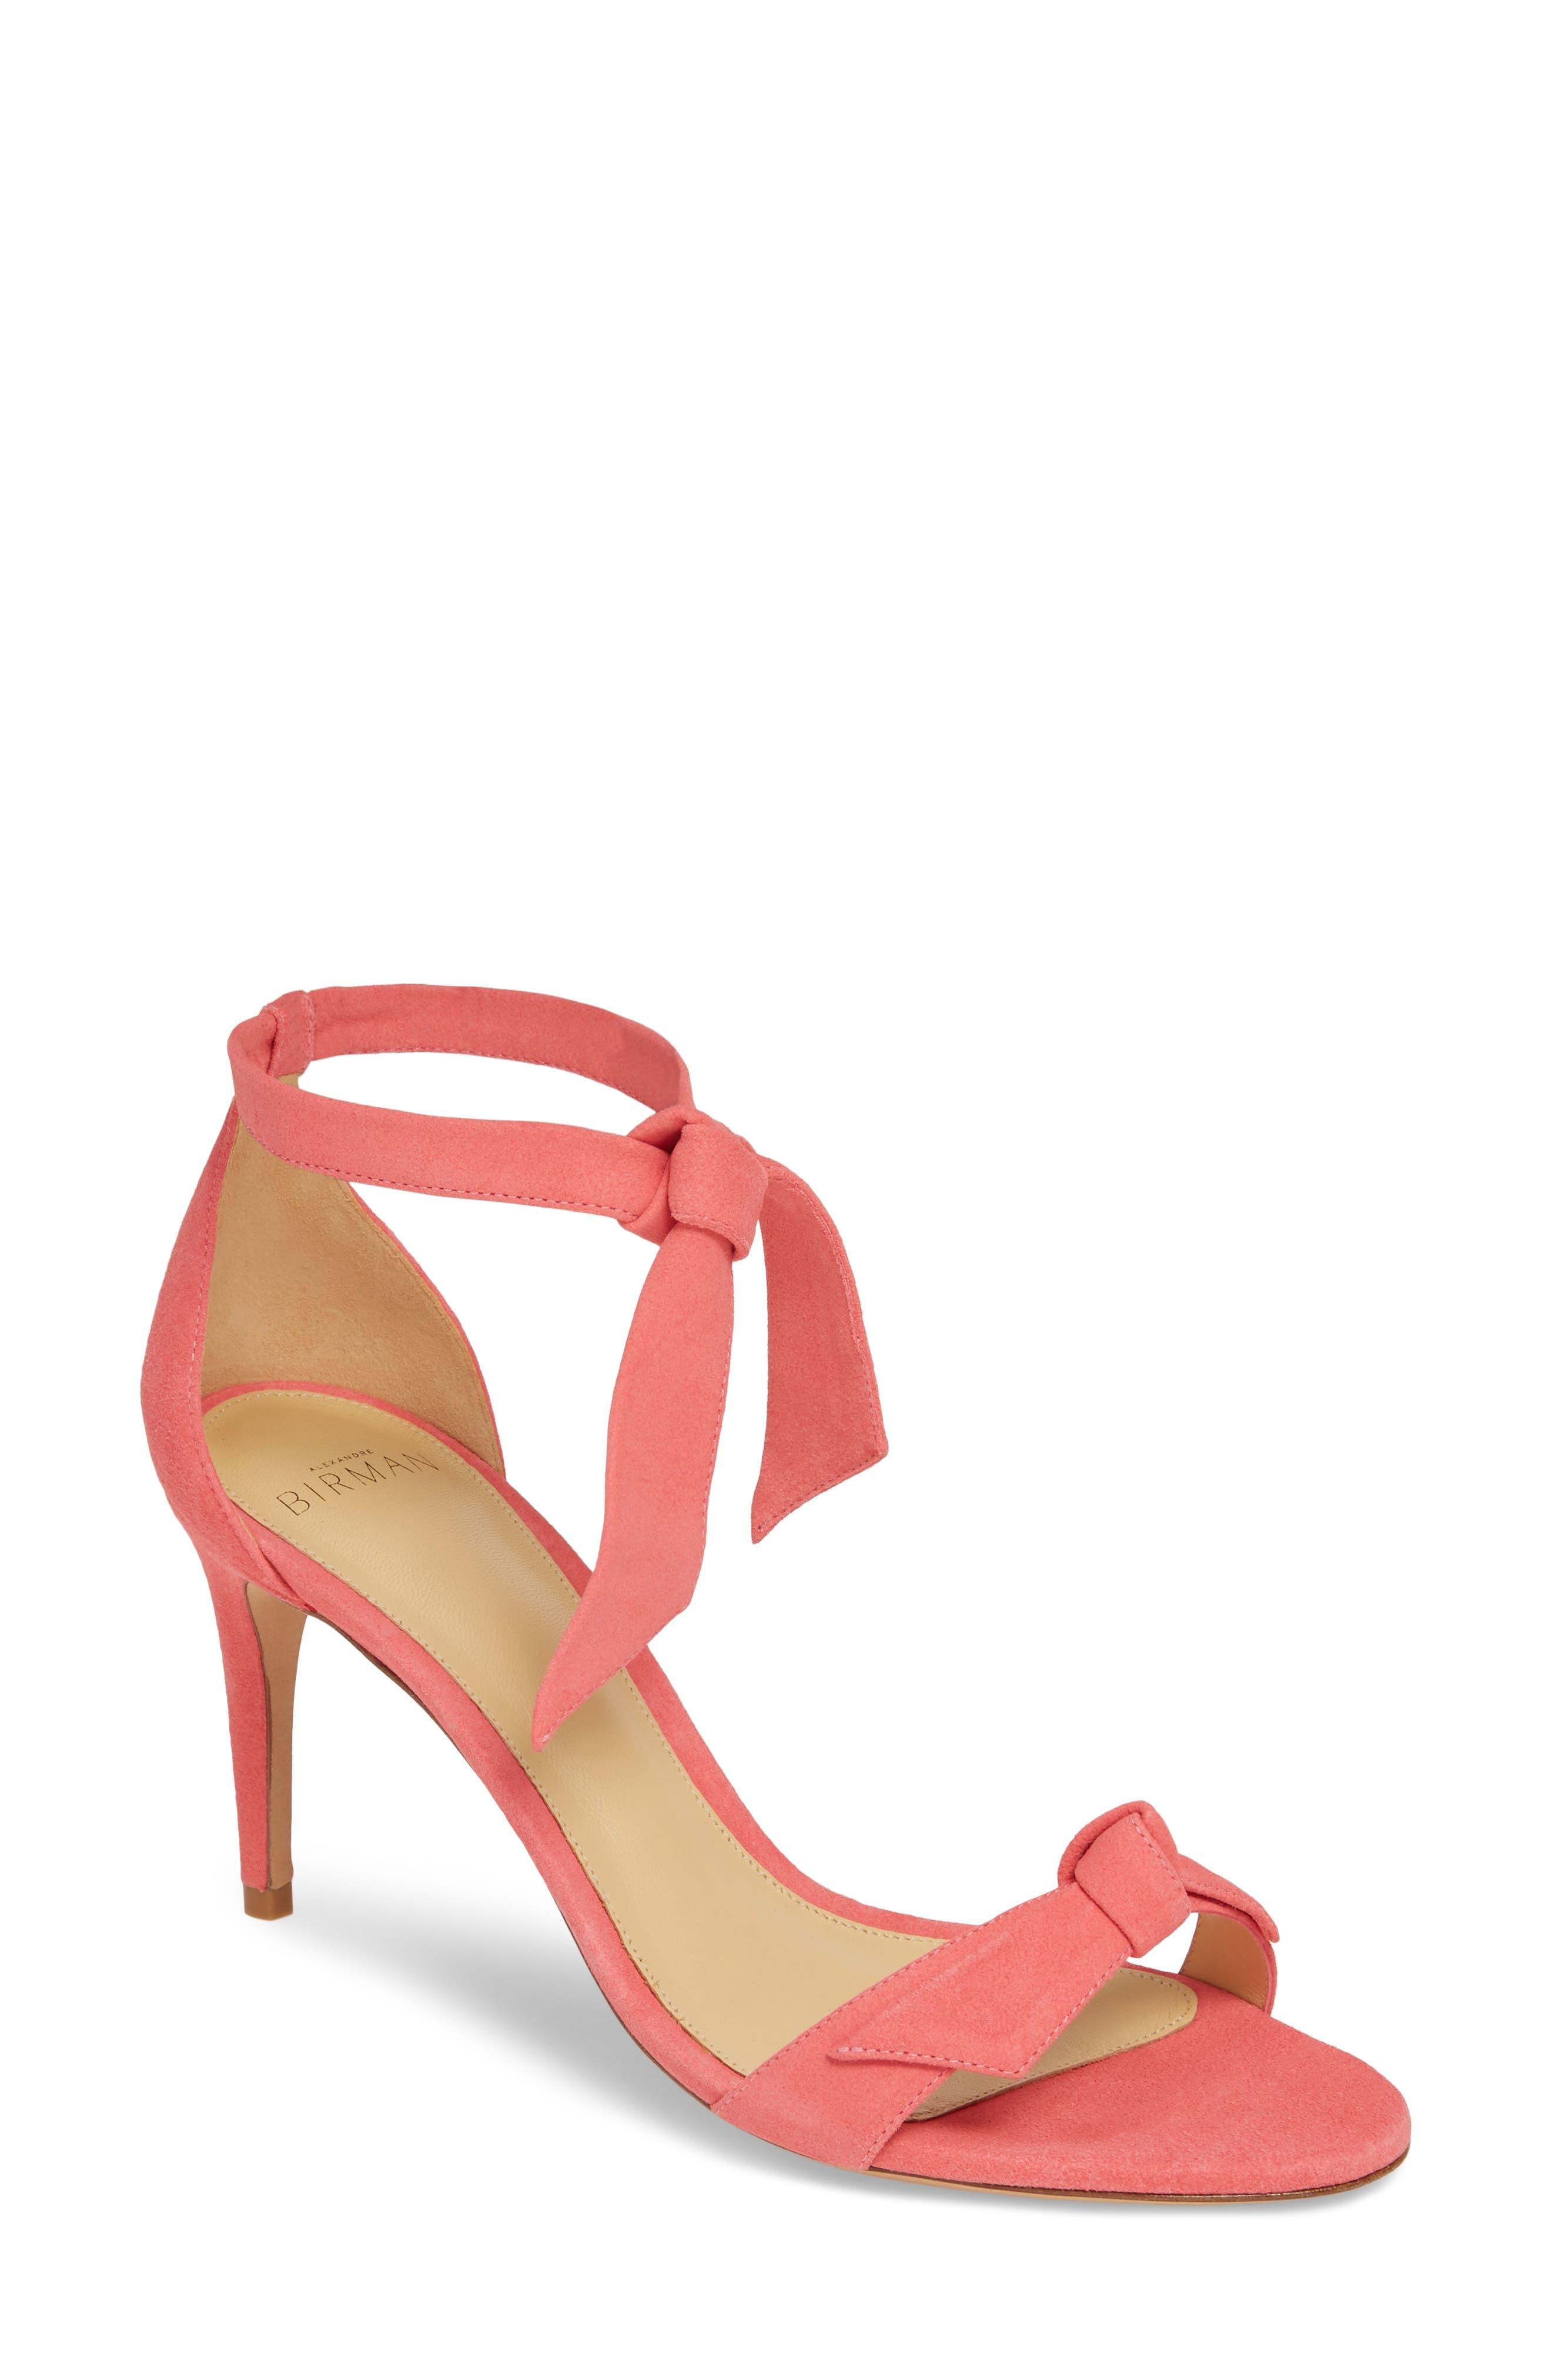 Alexandre Birman Clarita Ankle Tie Sandal, Pink